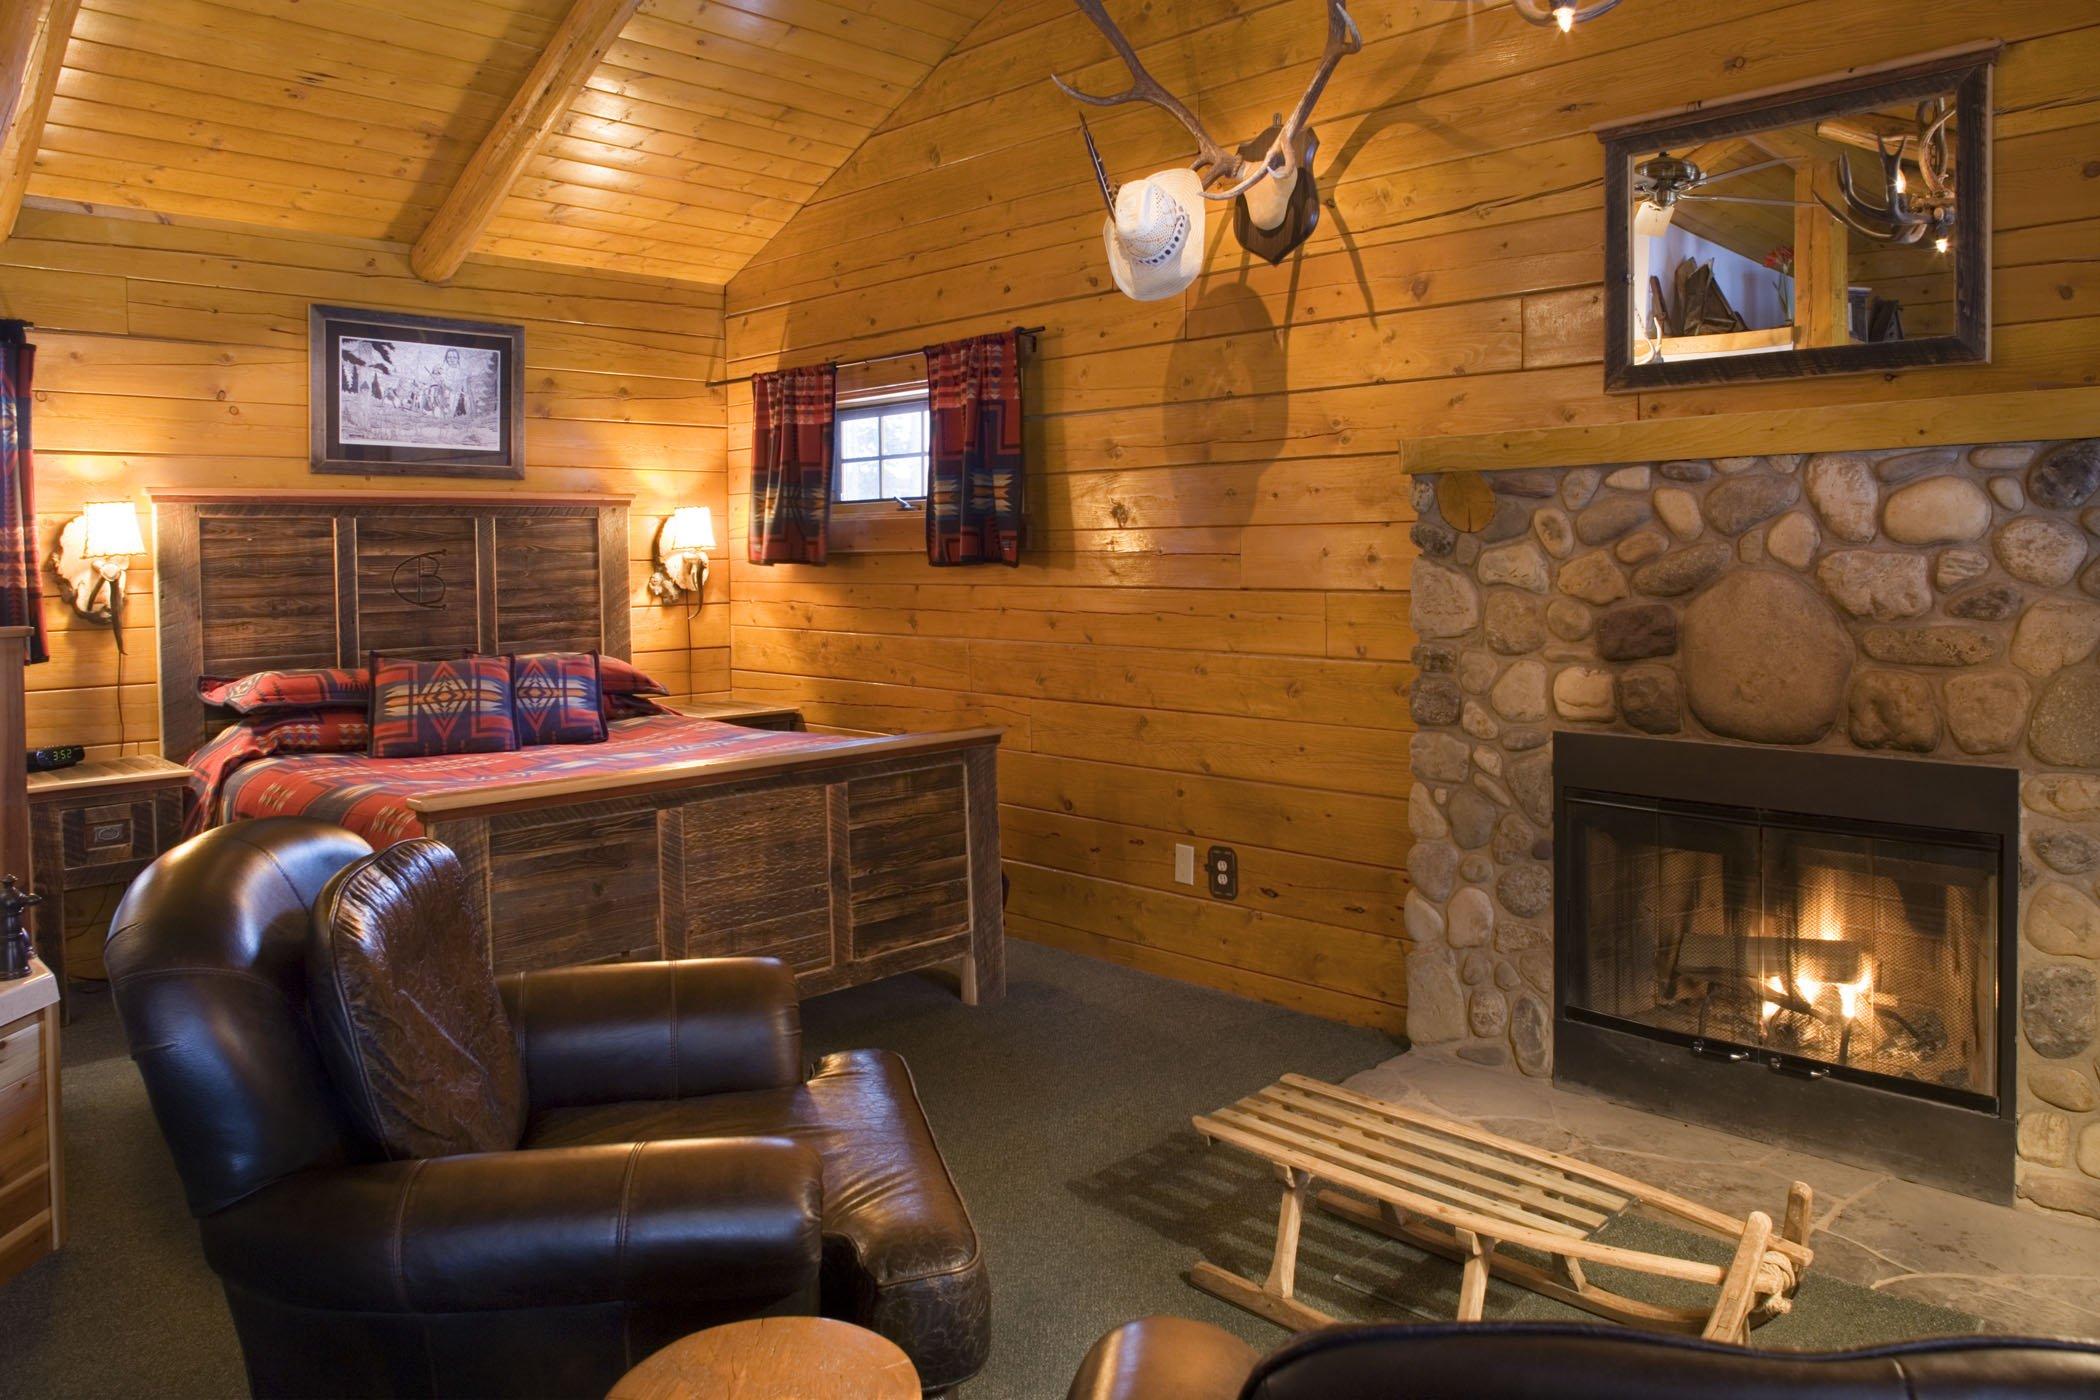 Lake Louise - Baker creek chalets heritage trapper's chalet.jpeg